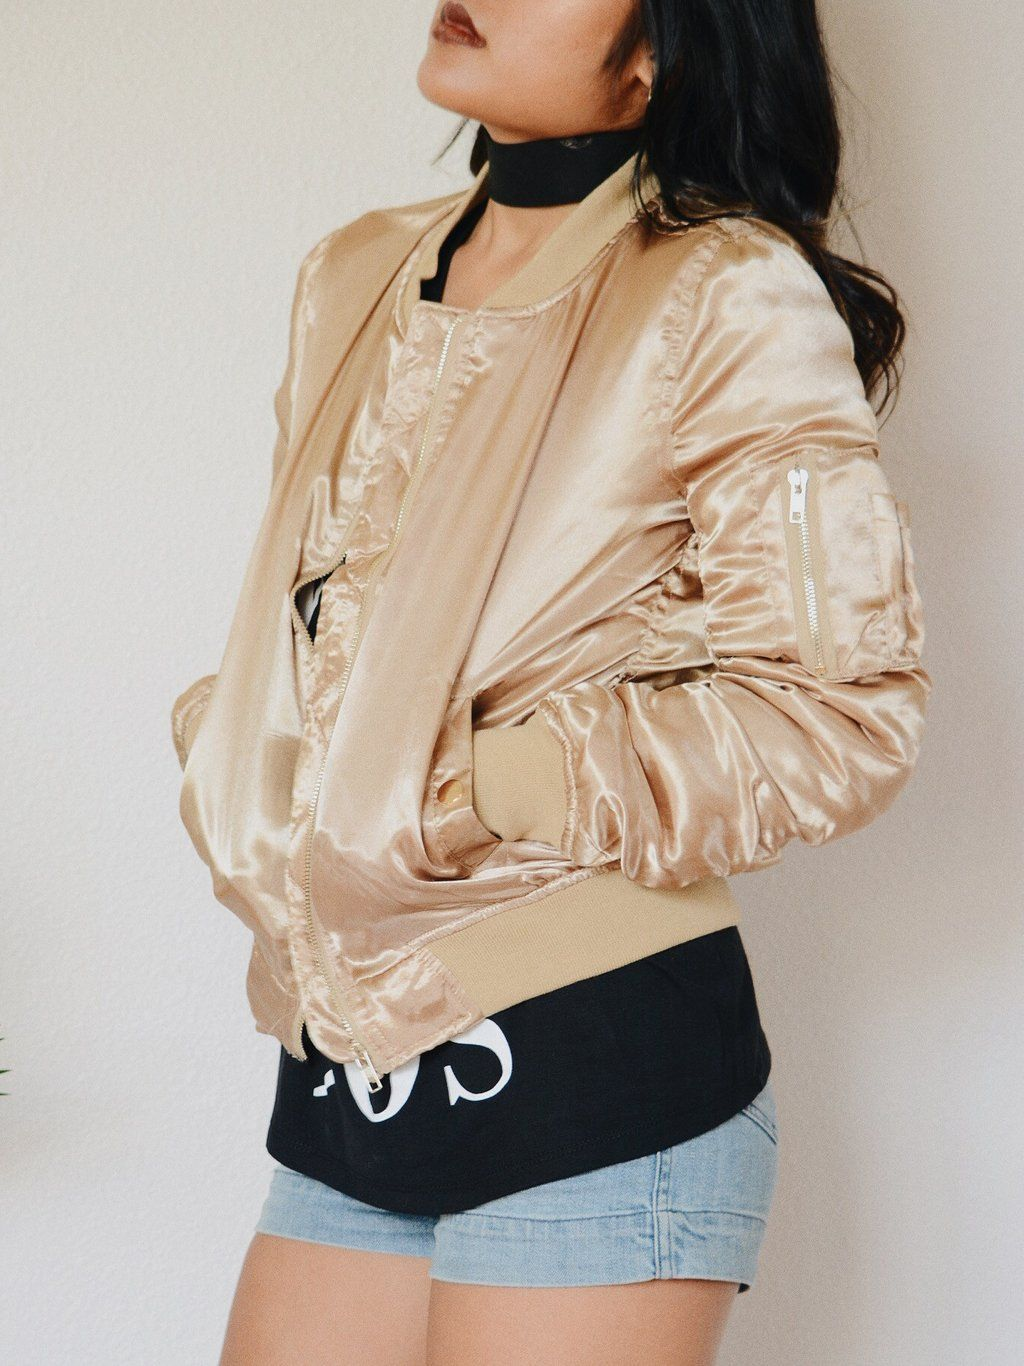 feeb98d8f9c Satin Bomber Jacket (Gold) | Bomber Jackets | Satin bomber jacket ...